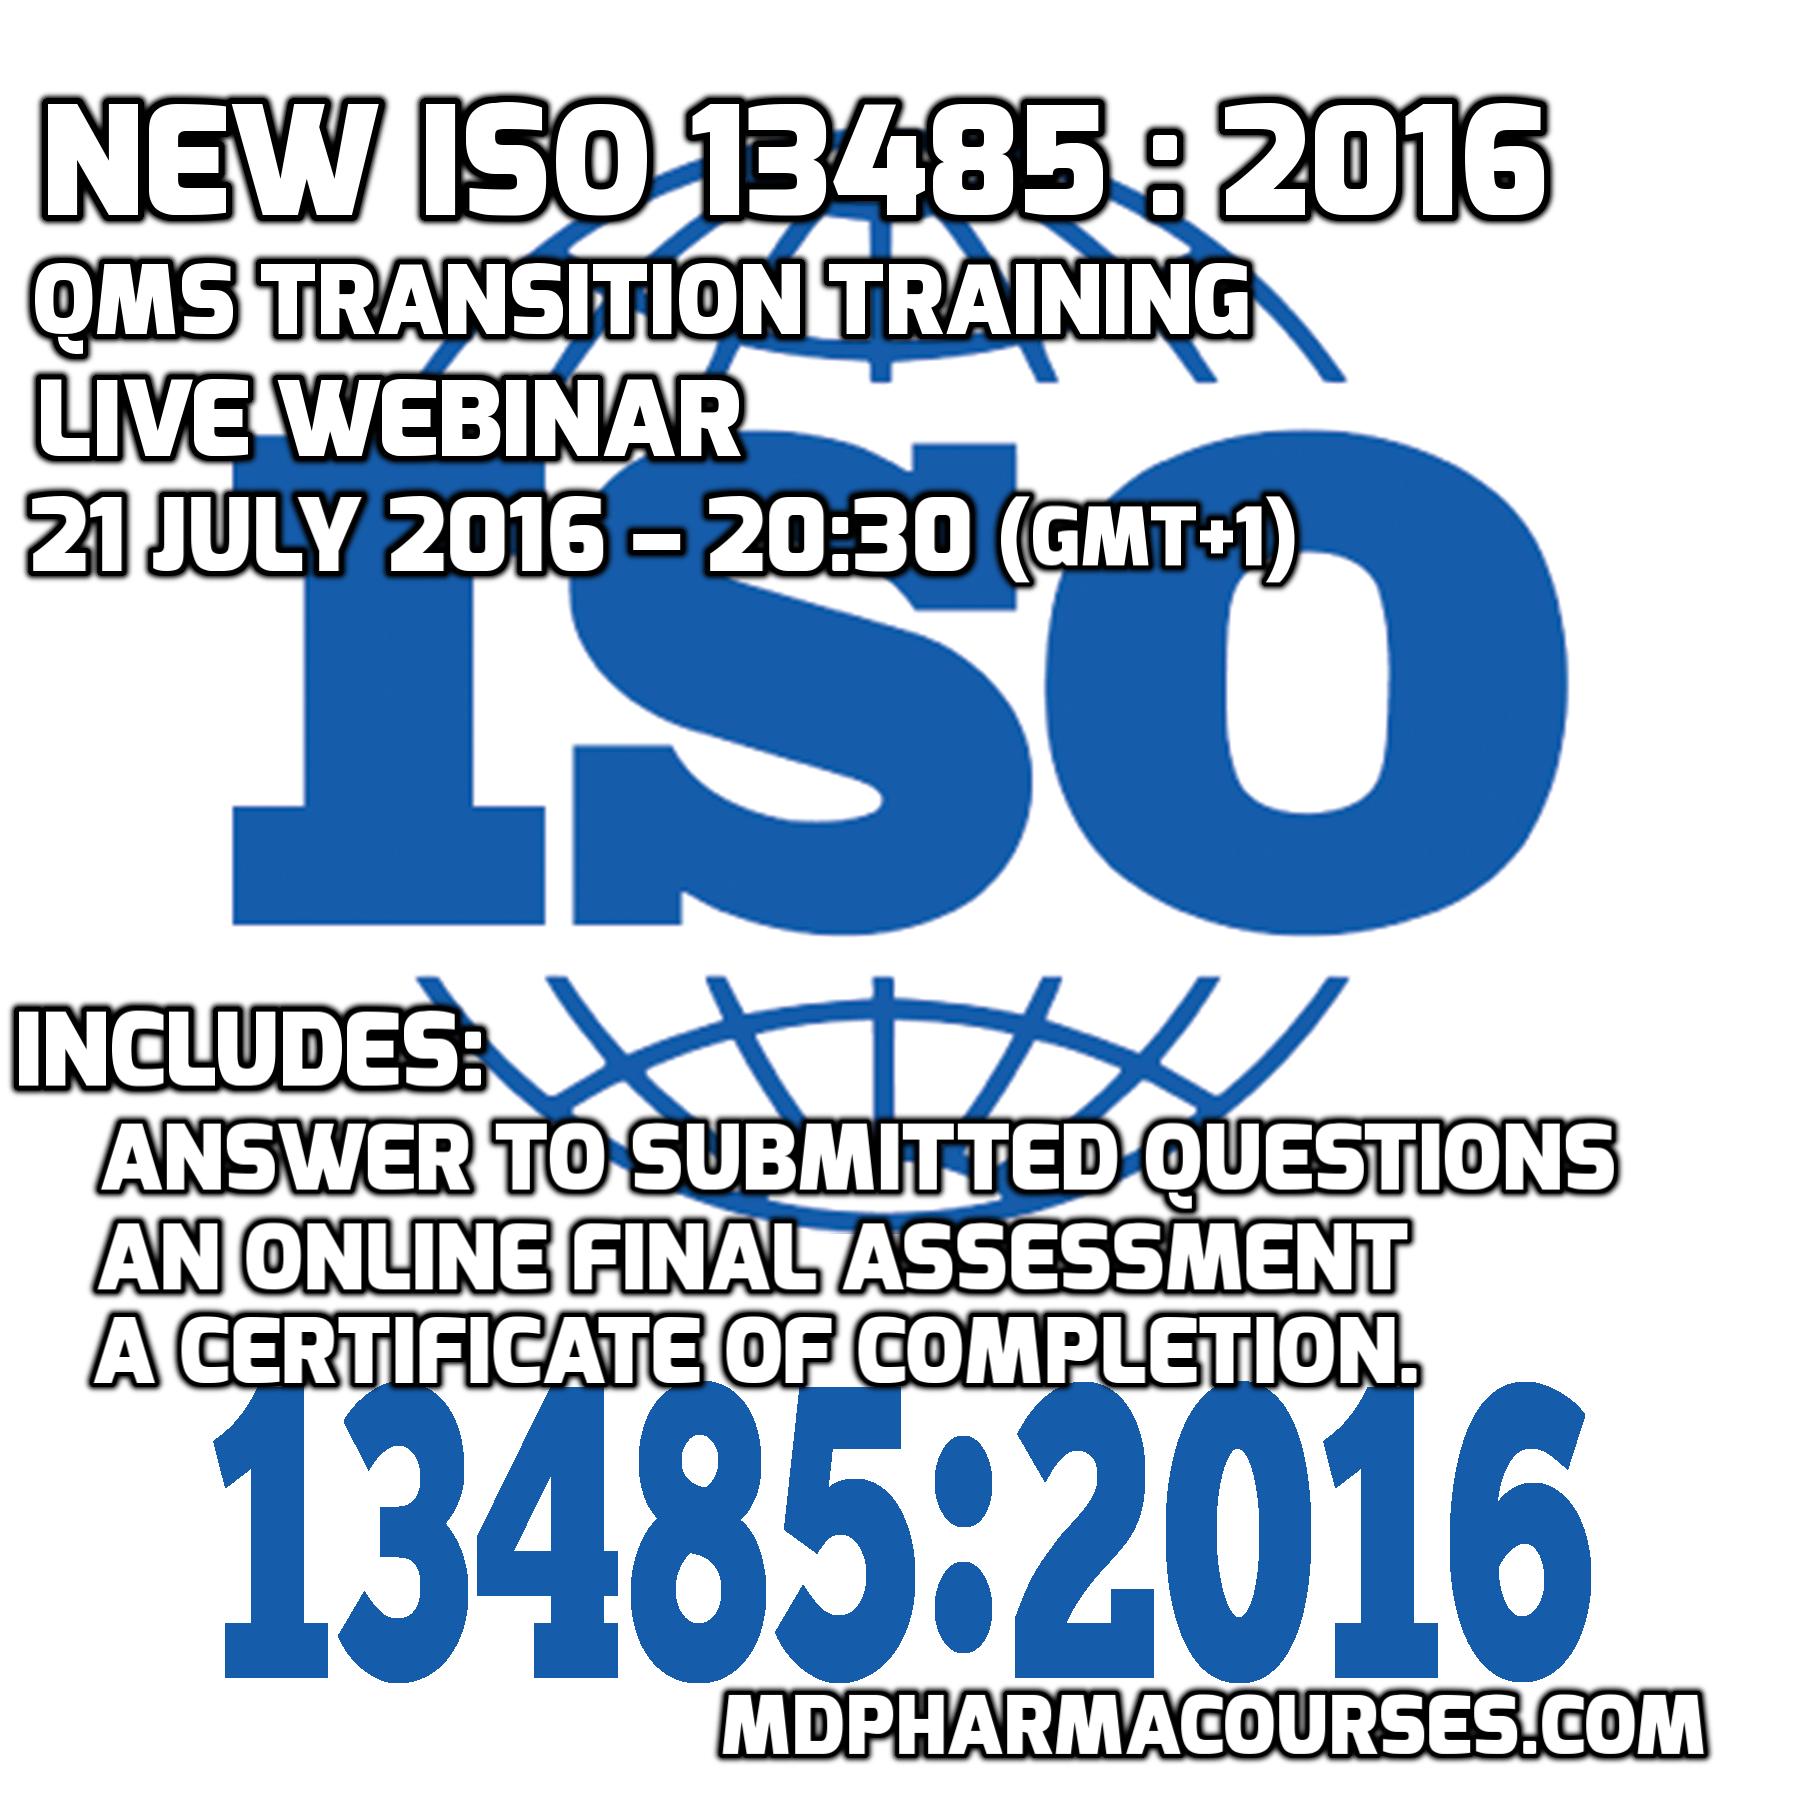 ISO-13485-2016-WEBINAR-TRAINING-MDPHARMACOURSES